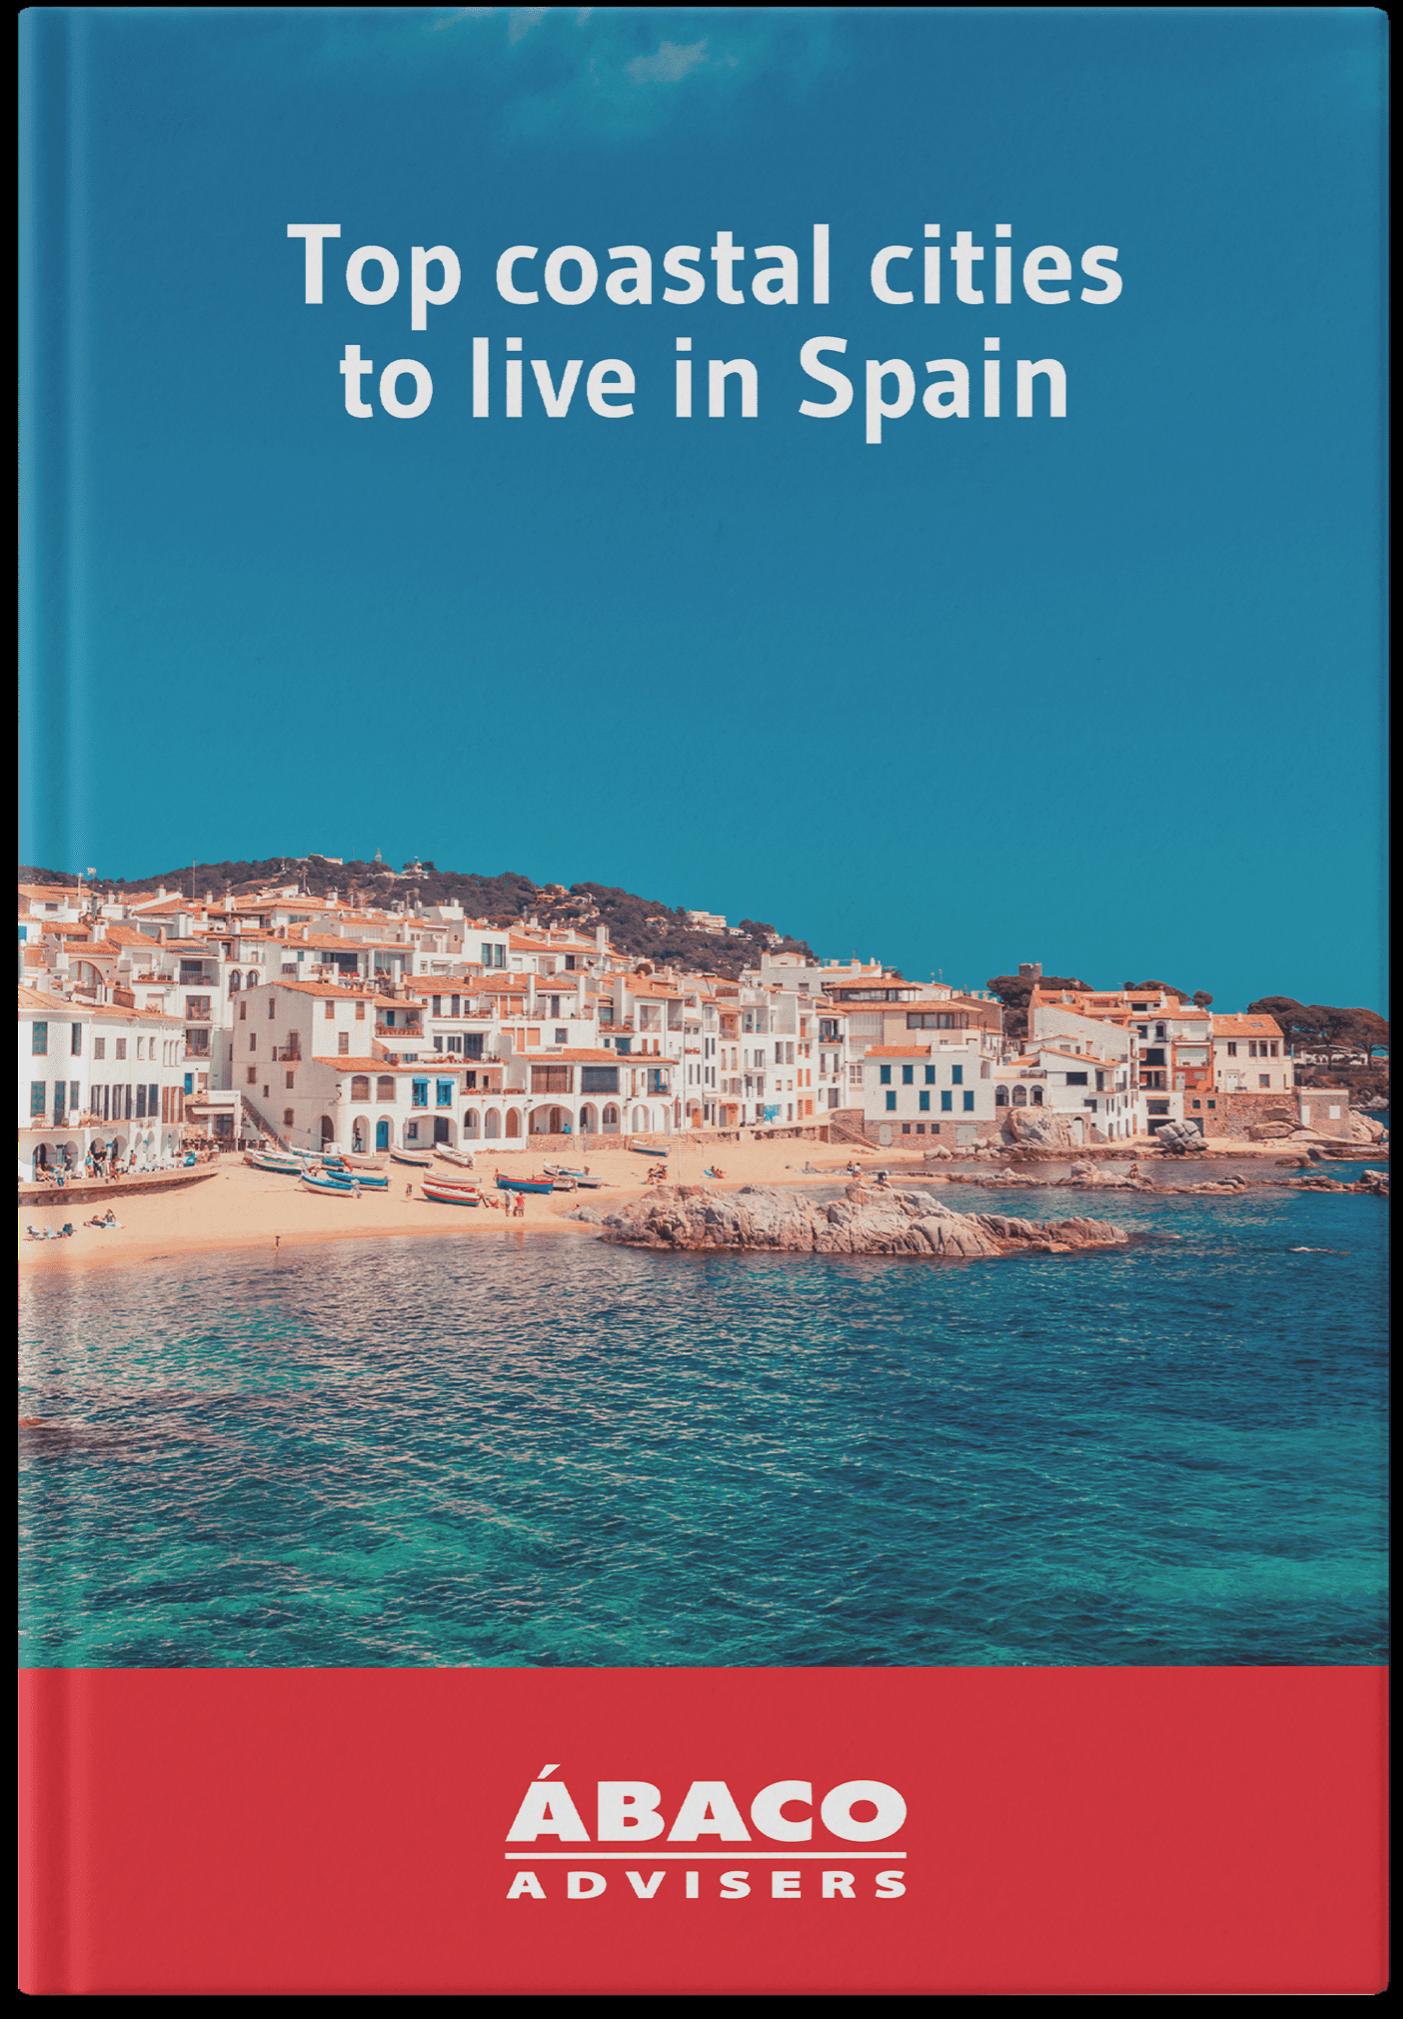 ABC - Top coastal cities to live in Spain - Portada comprimido - Edited